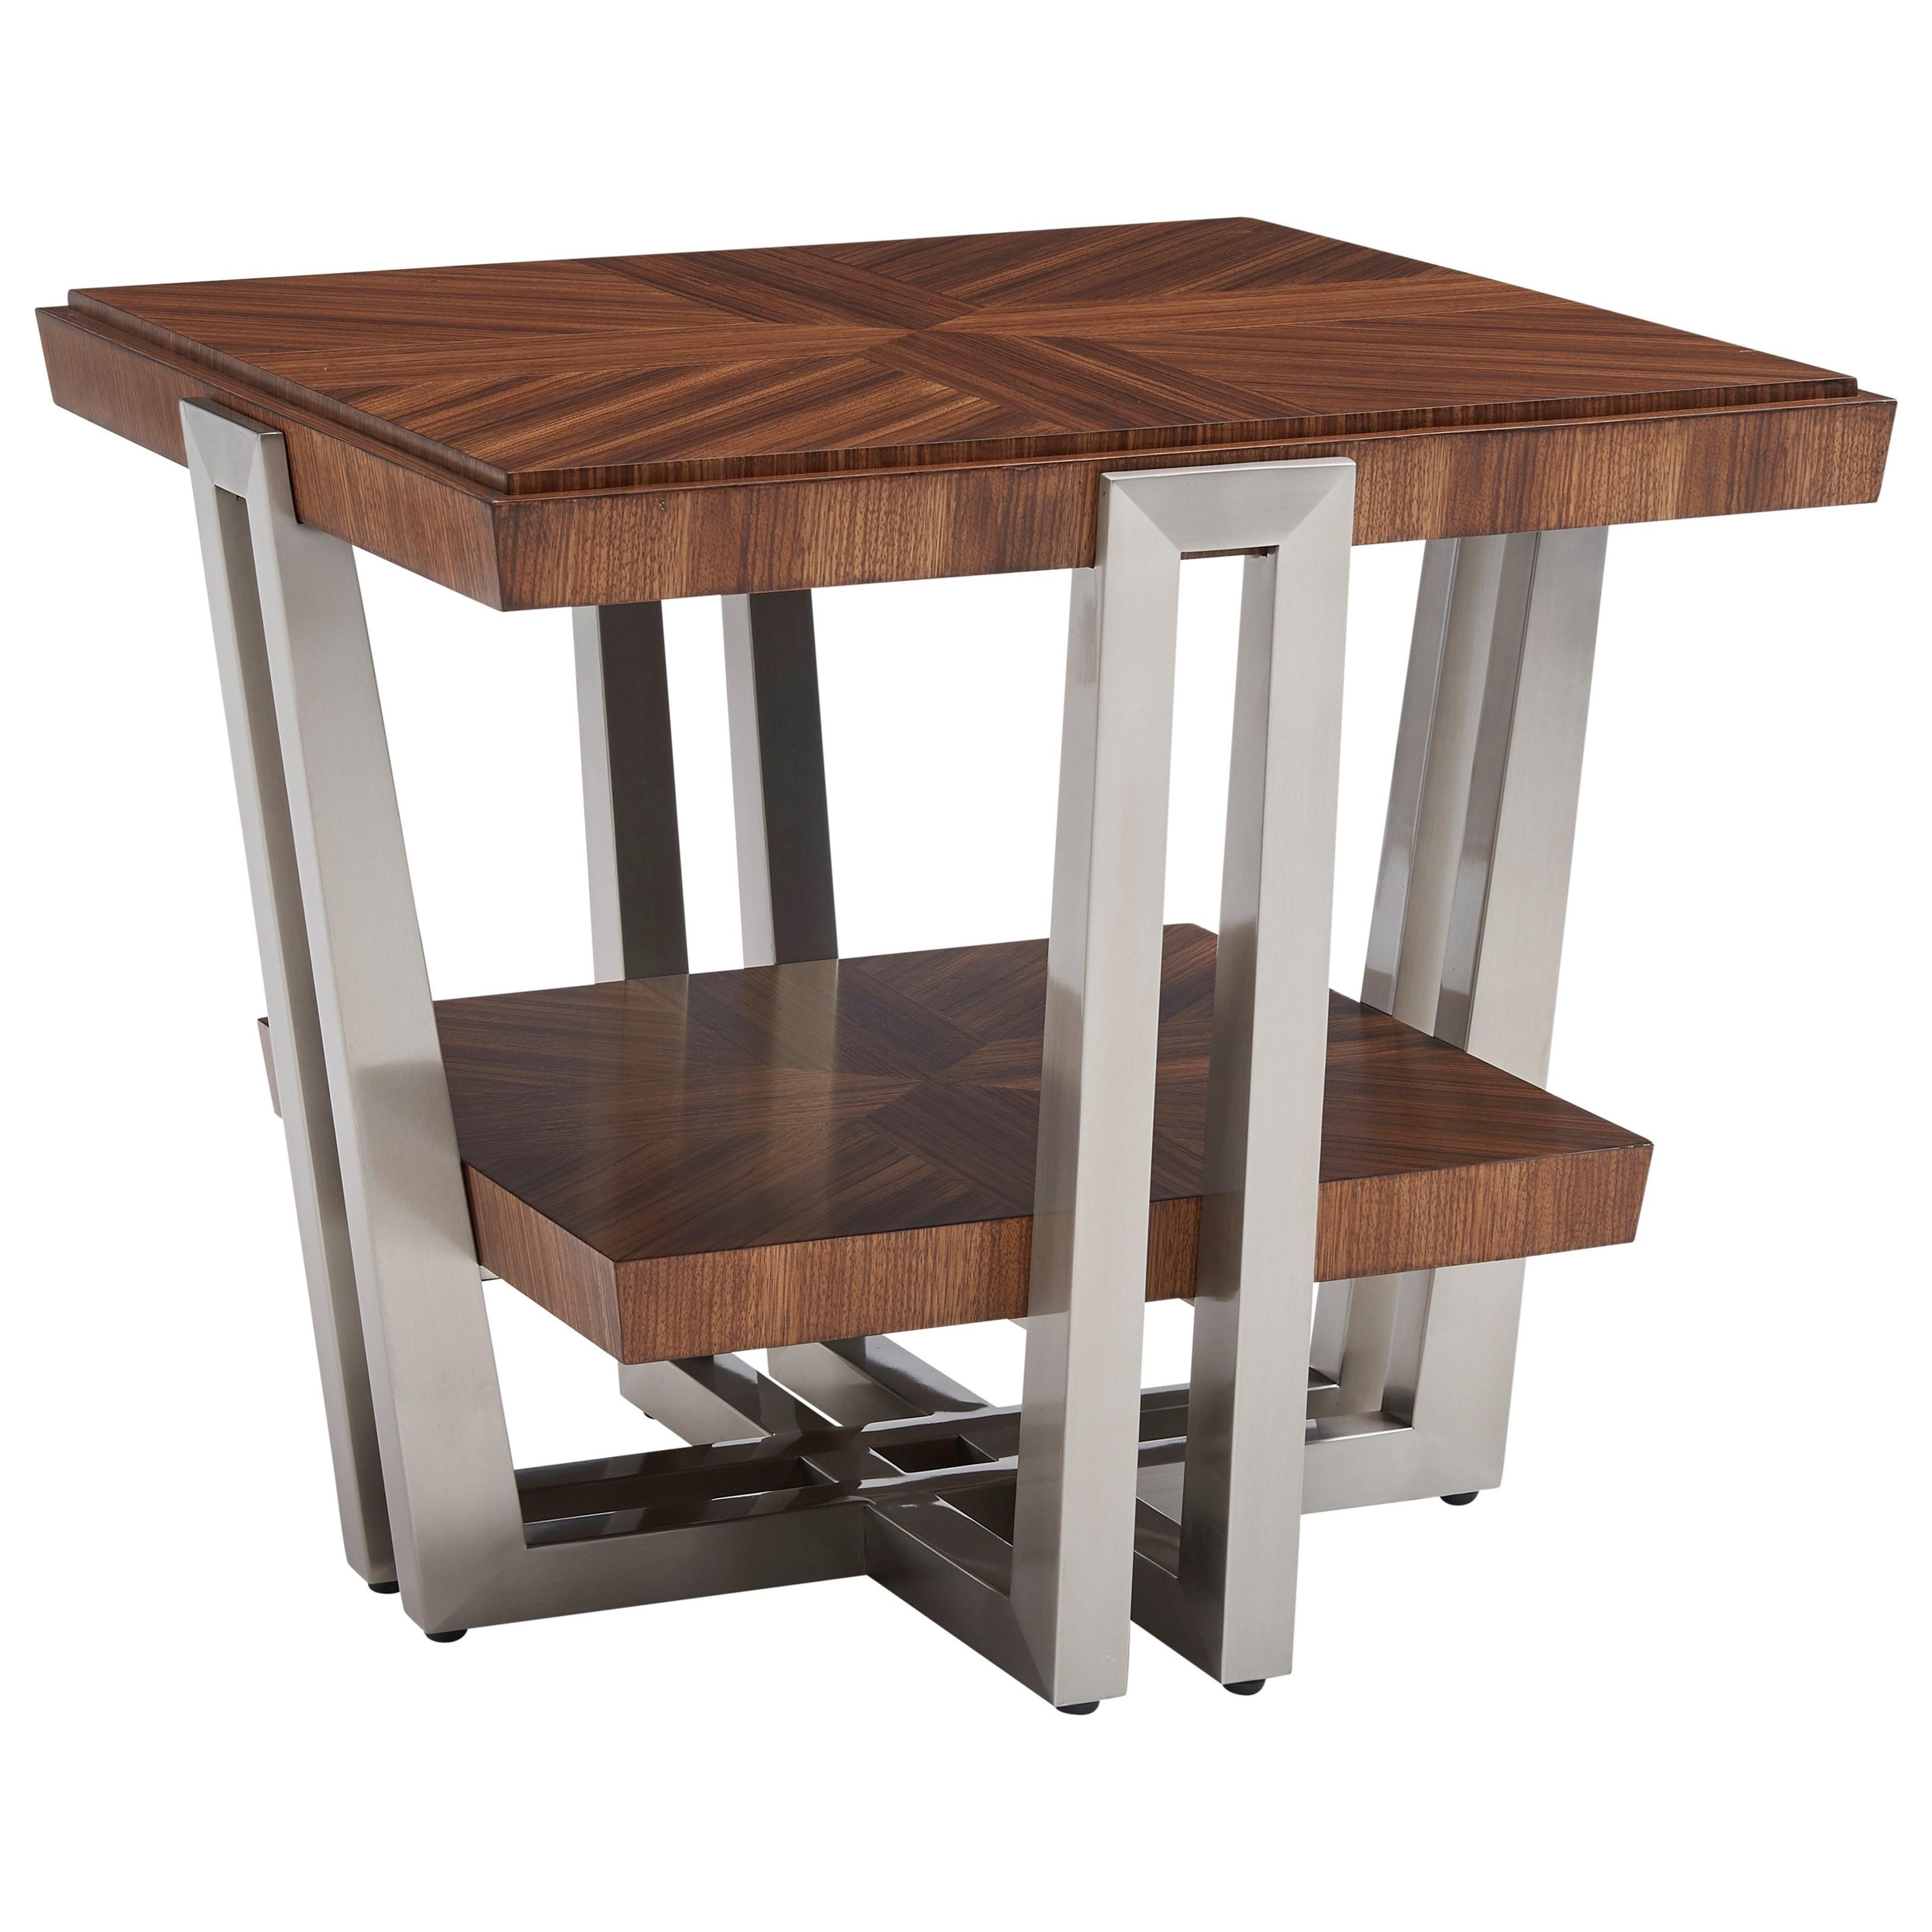 Kitano Gianni Square End Table by Lexington at Johnny Janosik